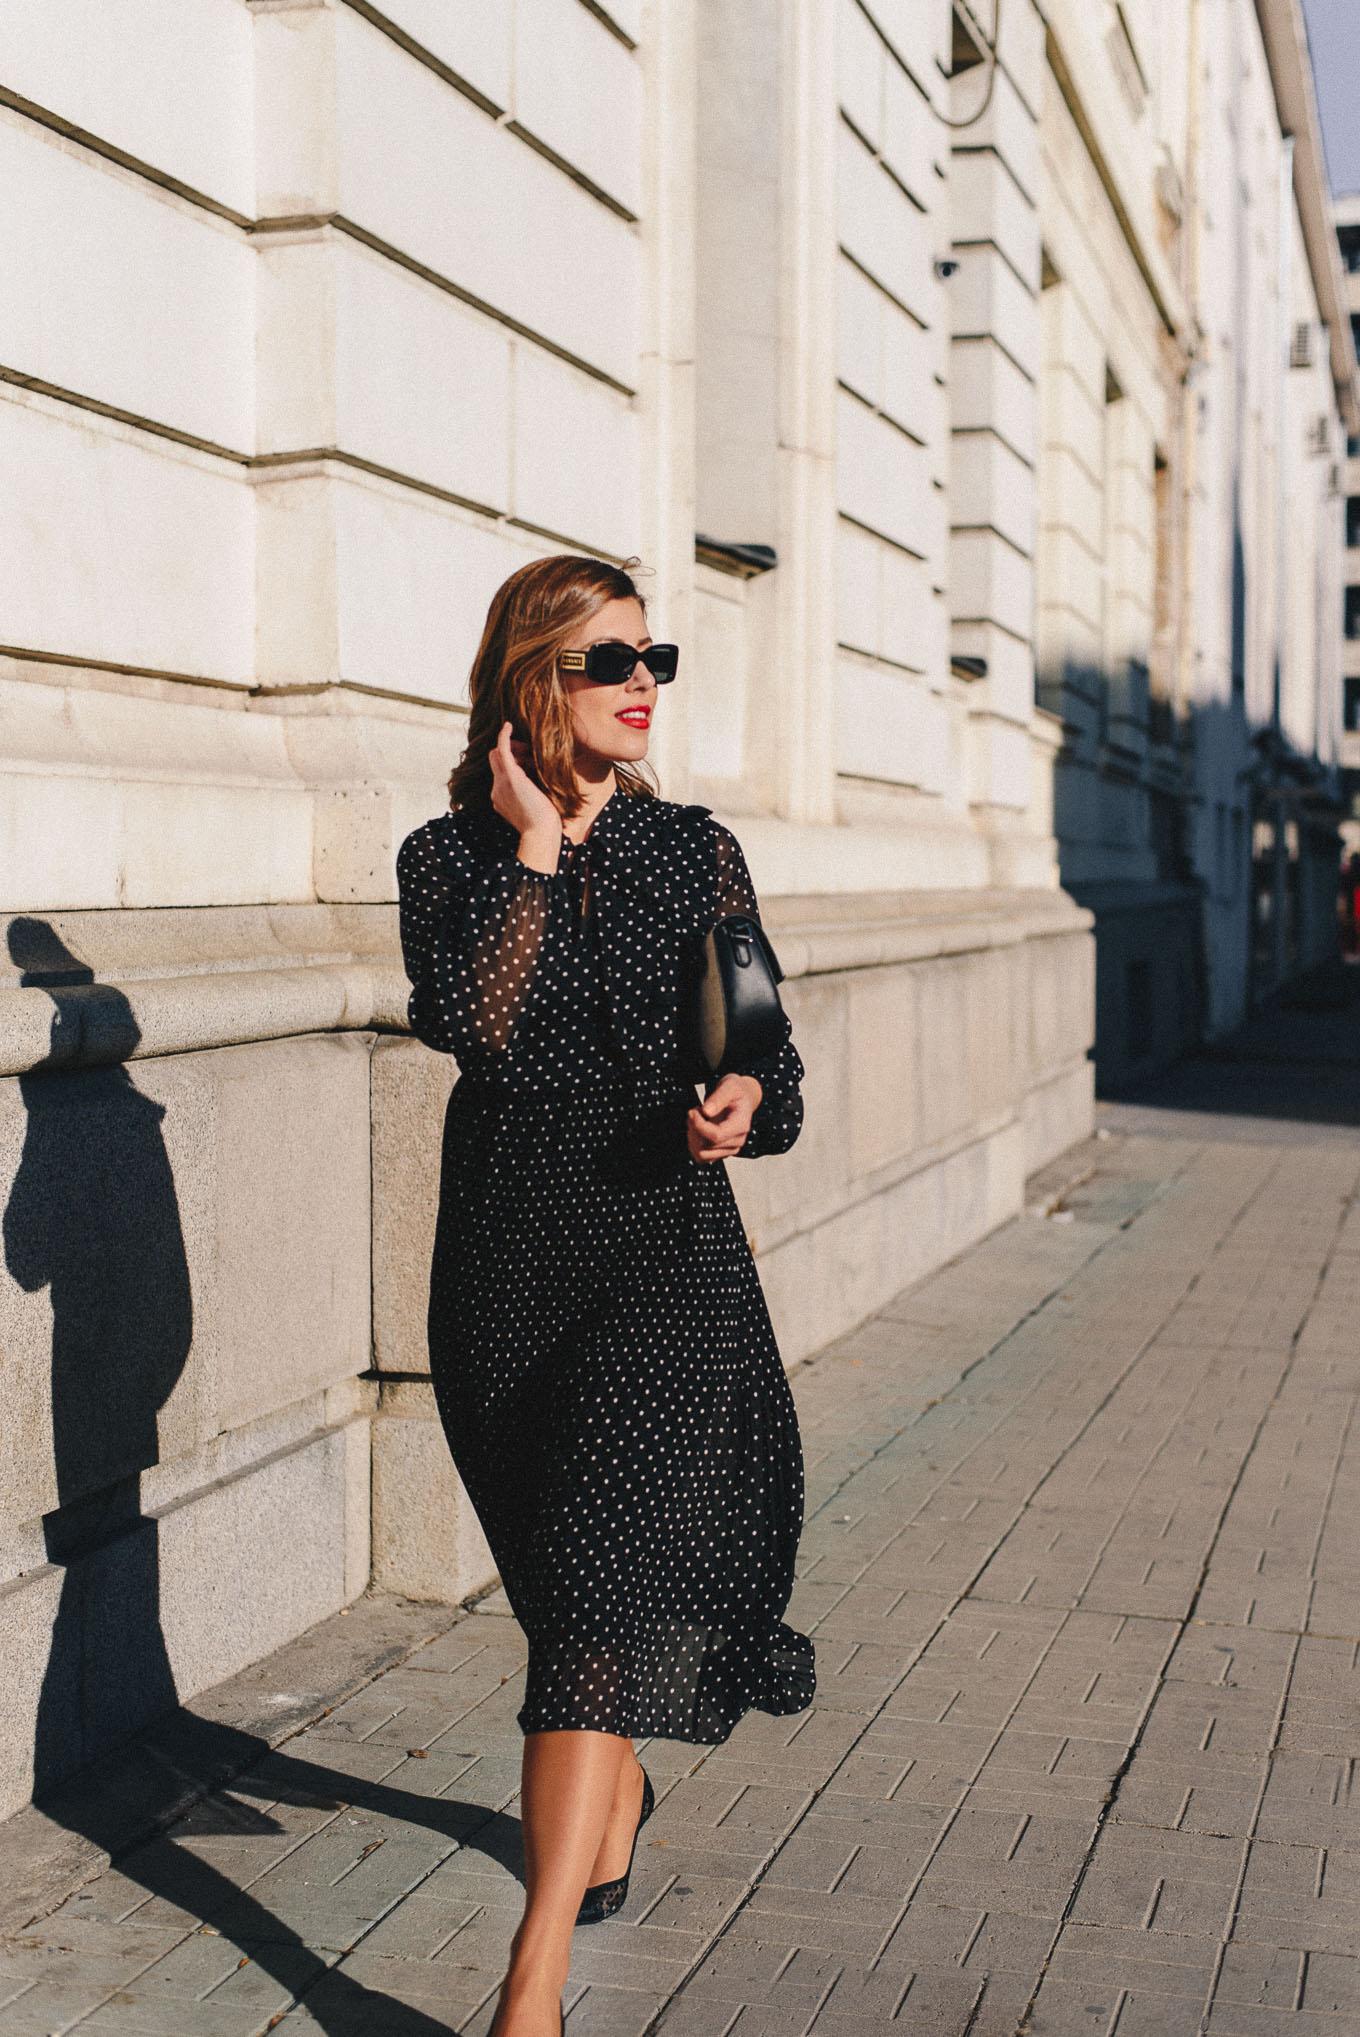 Bulgarian style blogger